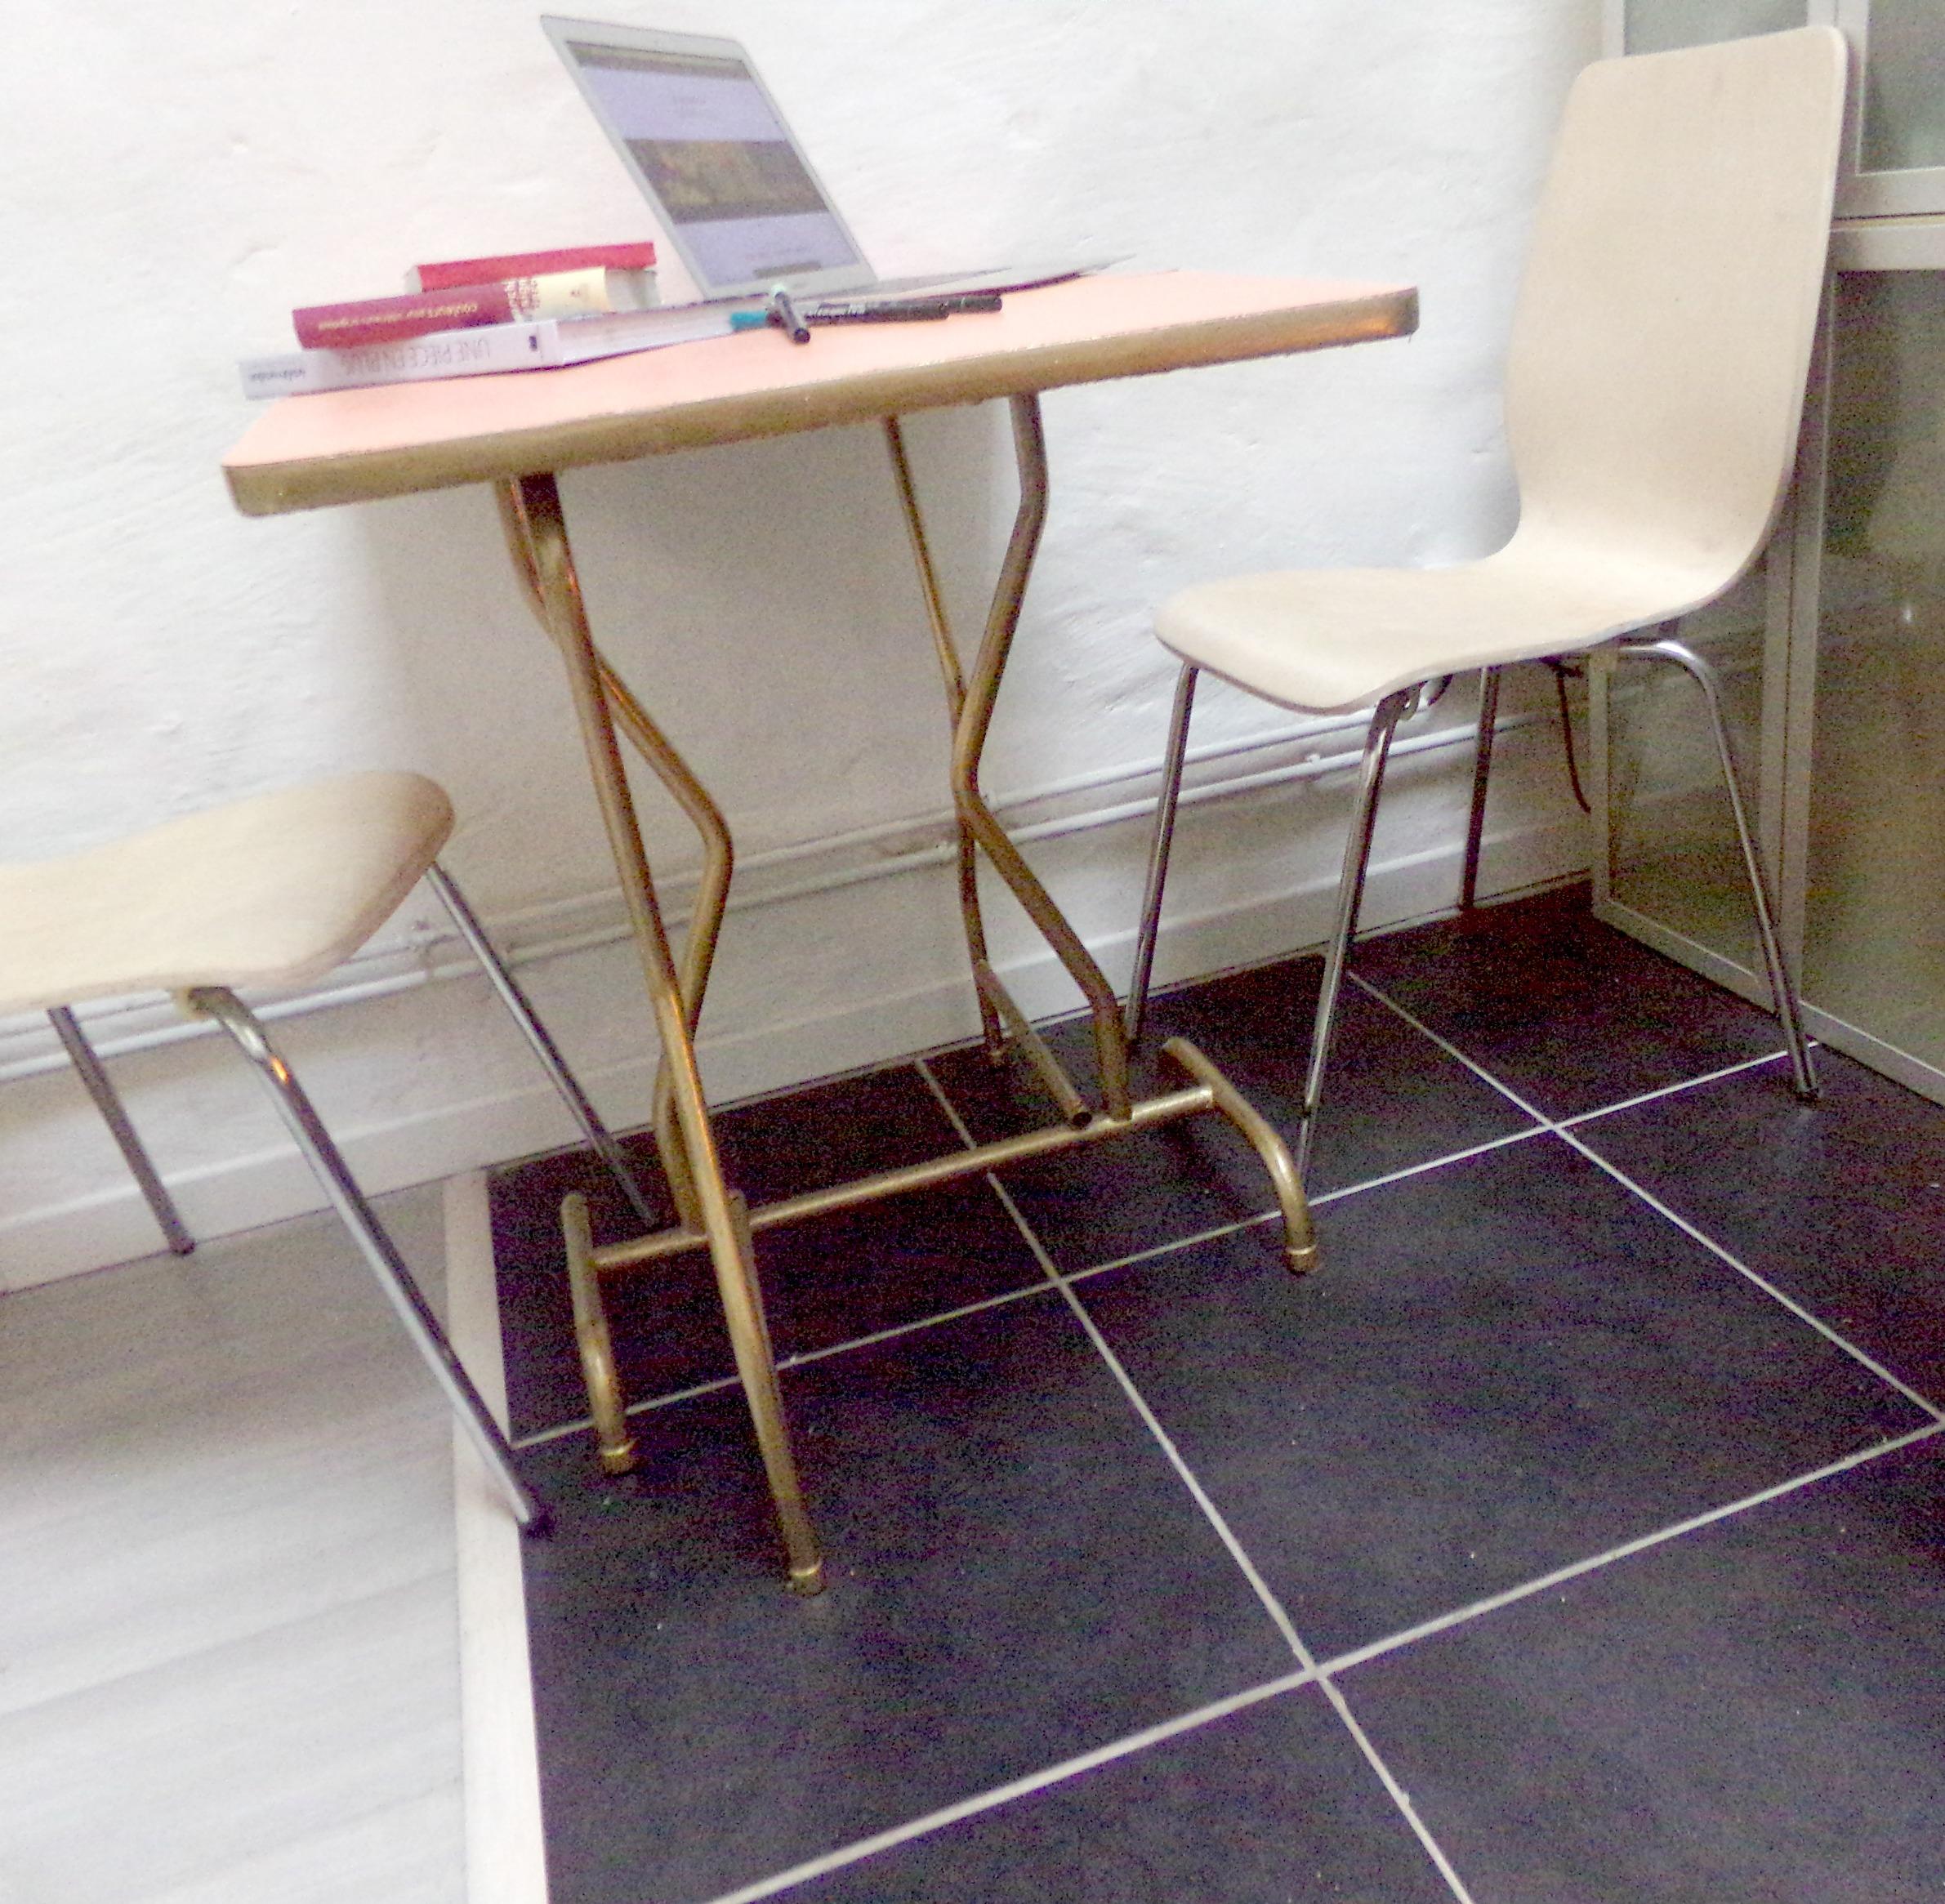 pietement table peinture metal sinto